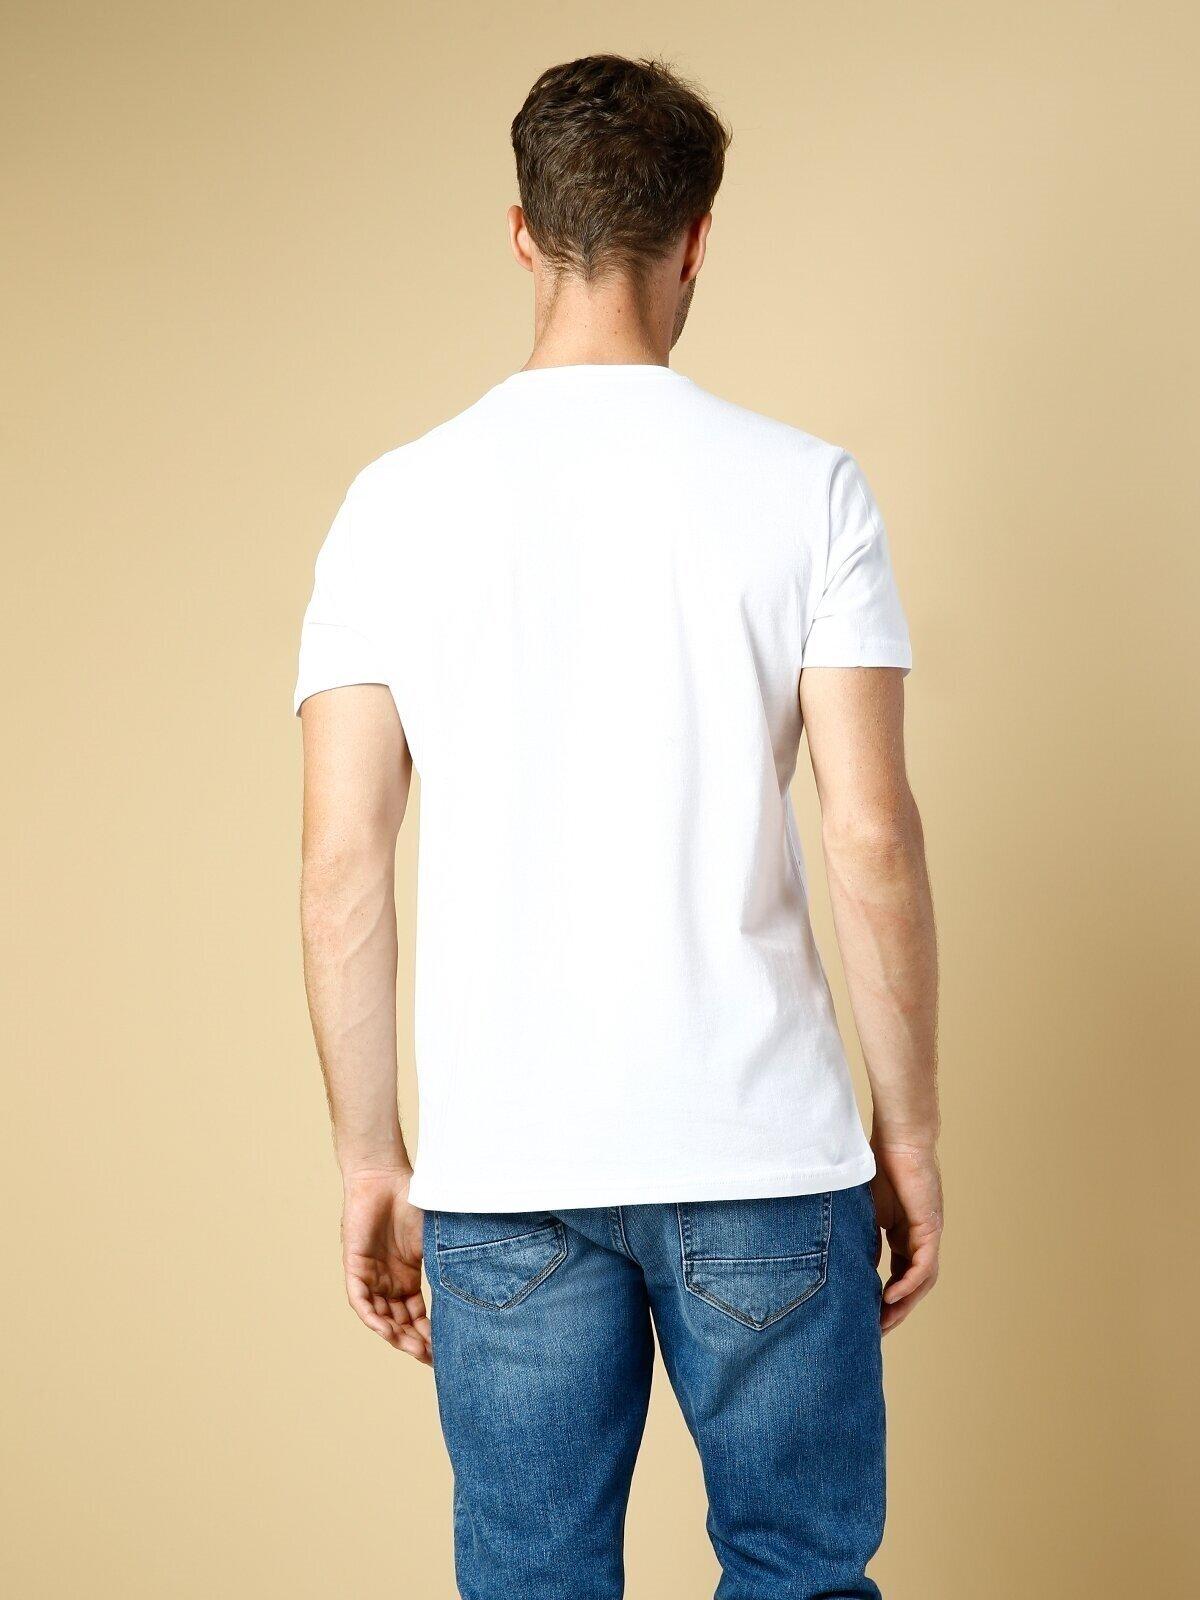 Regular Fit Bisiklet Yaka Örme Erkek Beyaz Kısa Kol Tişört